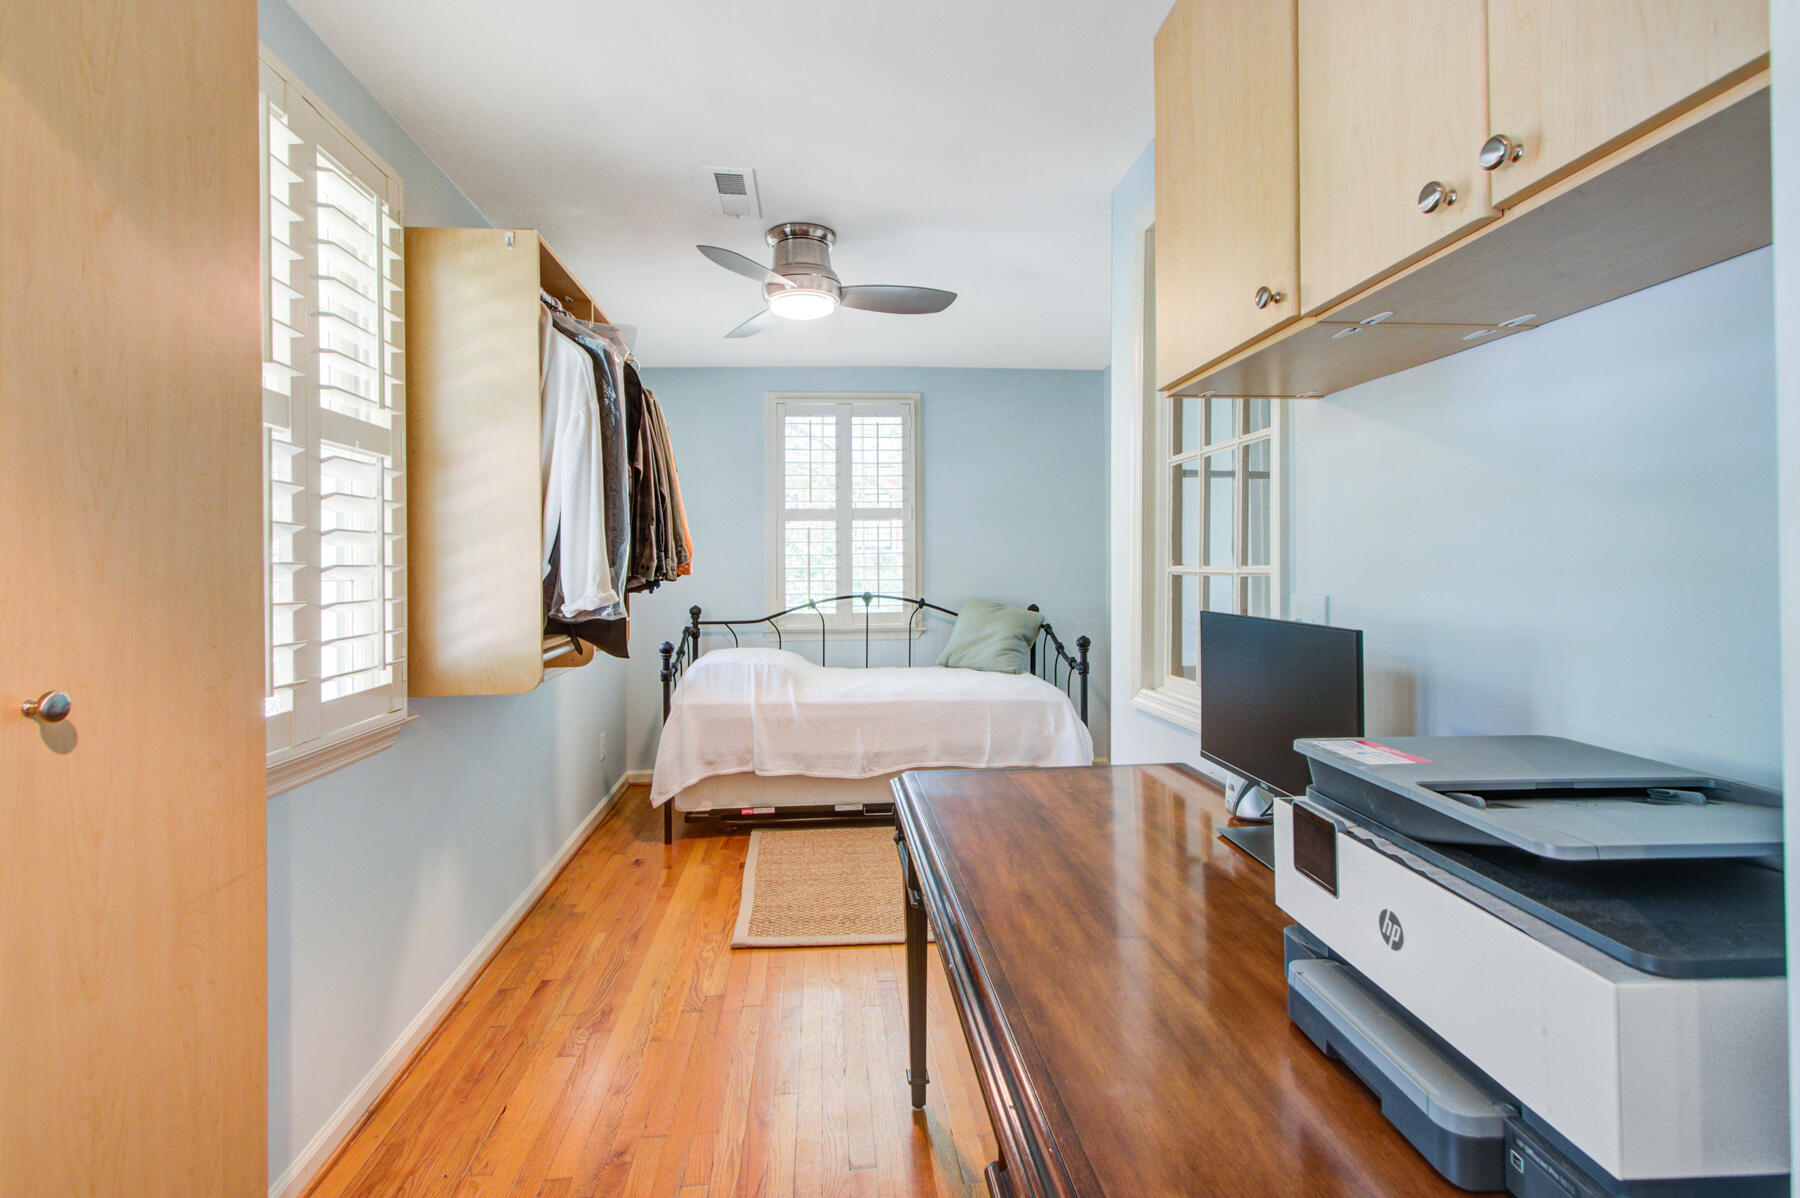 Radcliffeborough Homes For Sale - 48 Radcliffe, Charleston, SC - 3